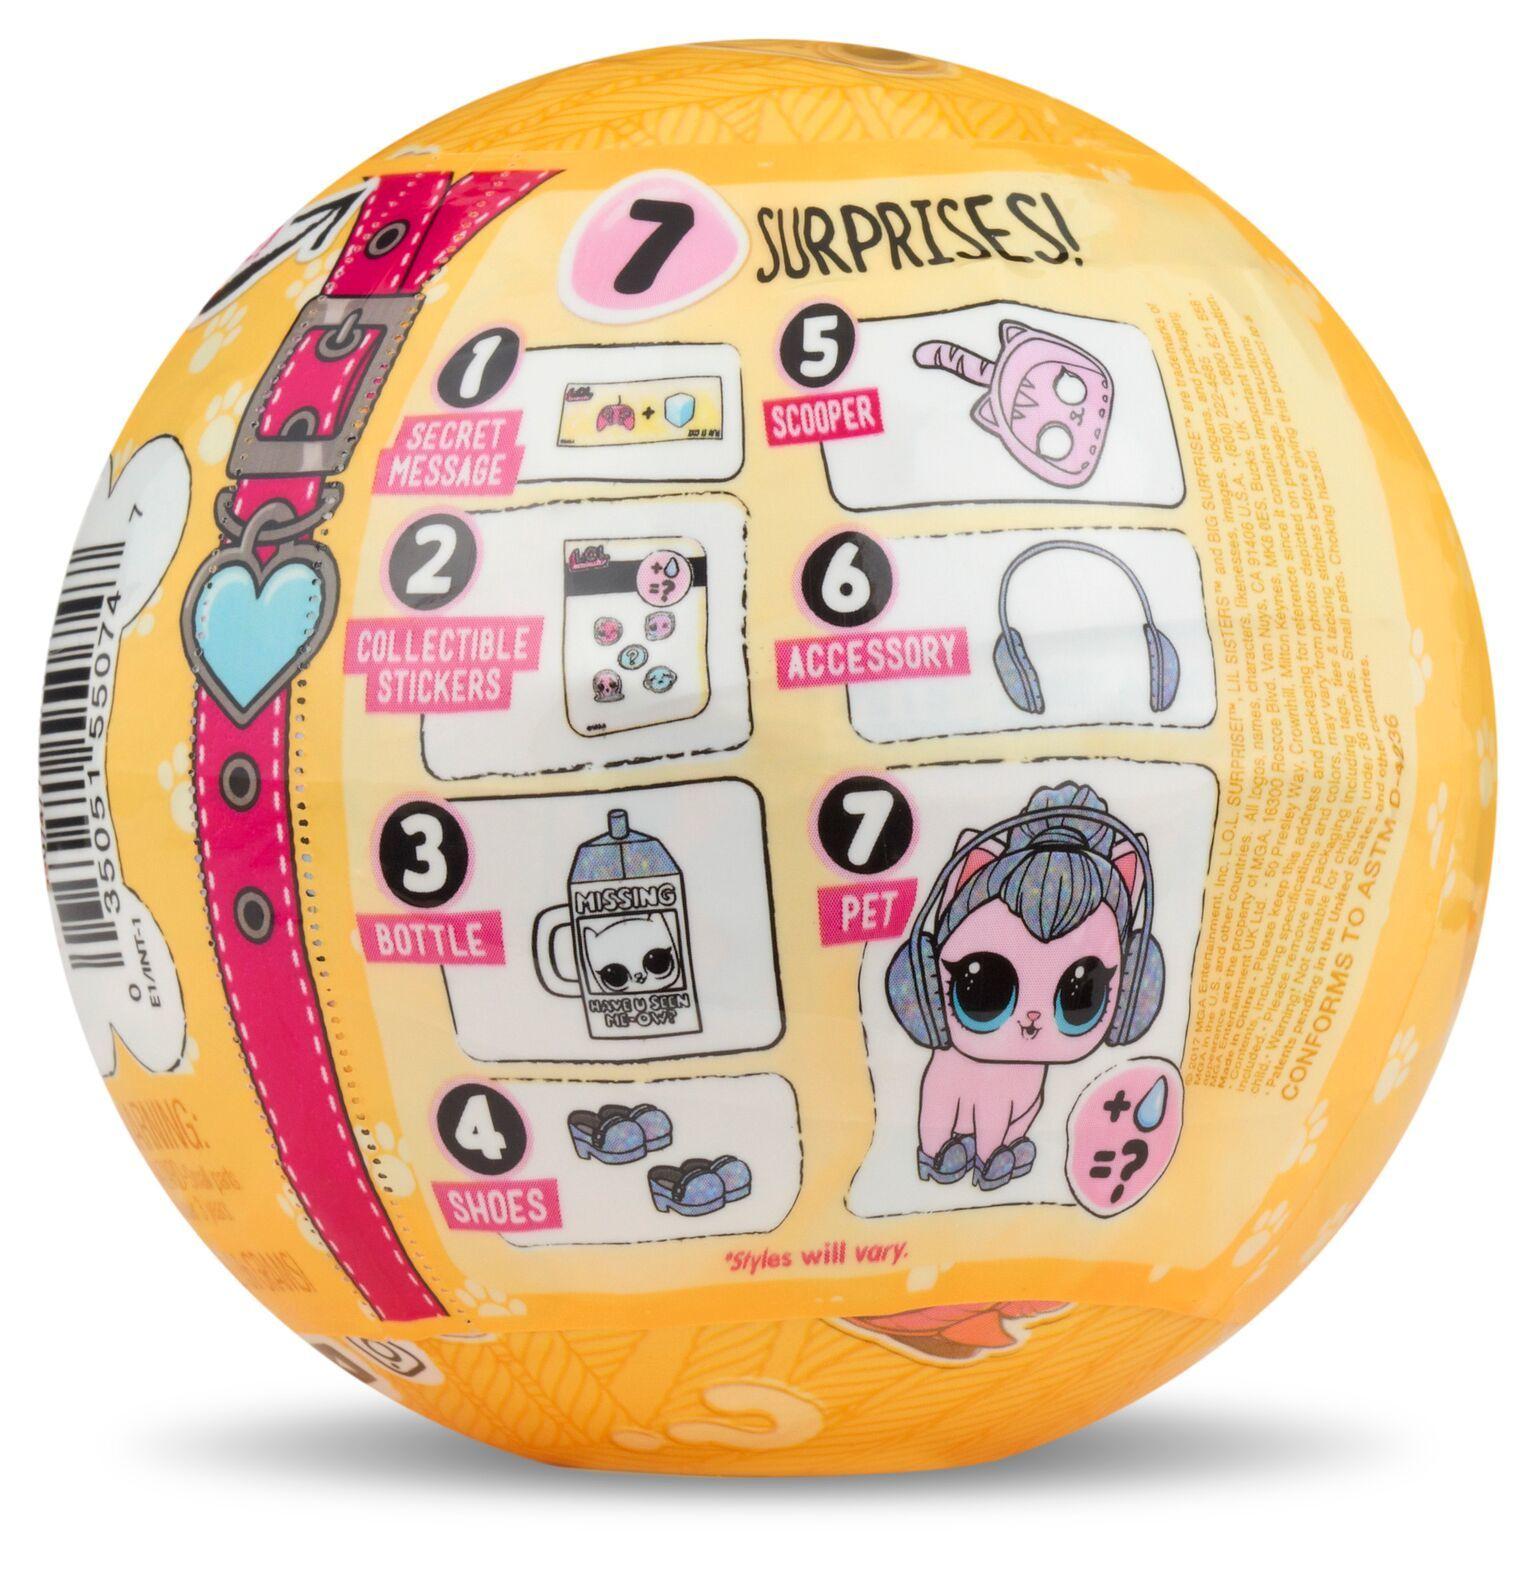 L.O.L: Surprise! Doll - Pet S3 (Blind Bag) image